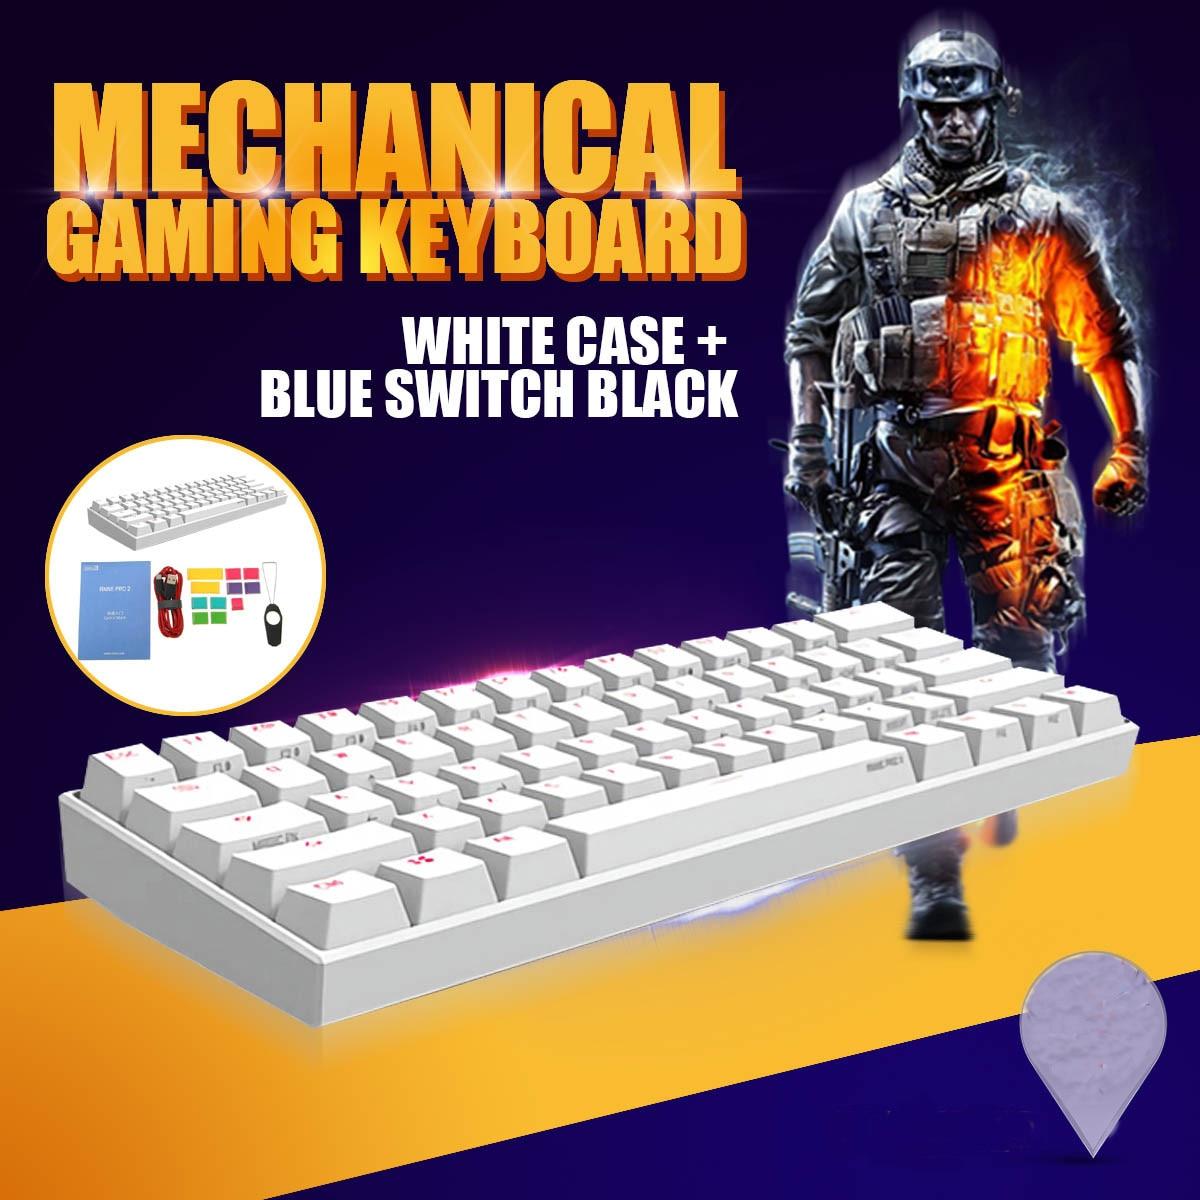 Obins Anne Pro 2 60% NKRO bluetooth 4.0 Type-C RGB Mechanical Gaming Keyboard Gateron SwitchObins Anne Pro 2 60% NKRO bluetooth 4.0 Type-C RGB Mechanical Gaming Keyboard Gateron Switch